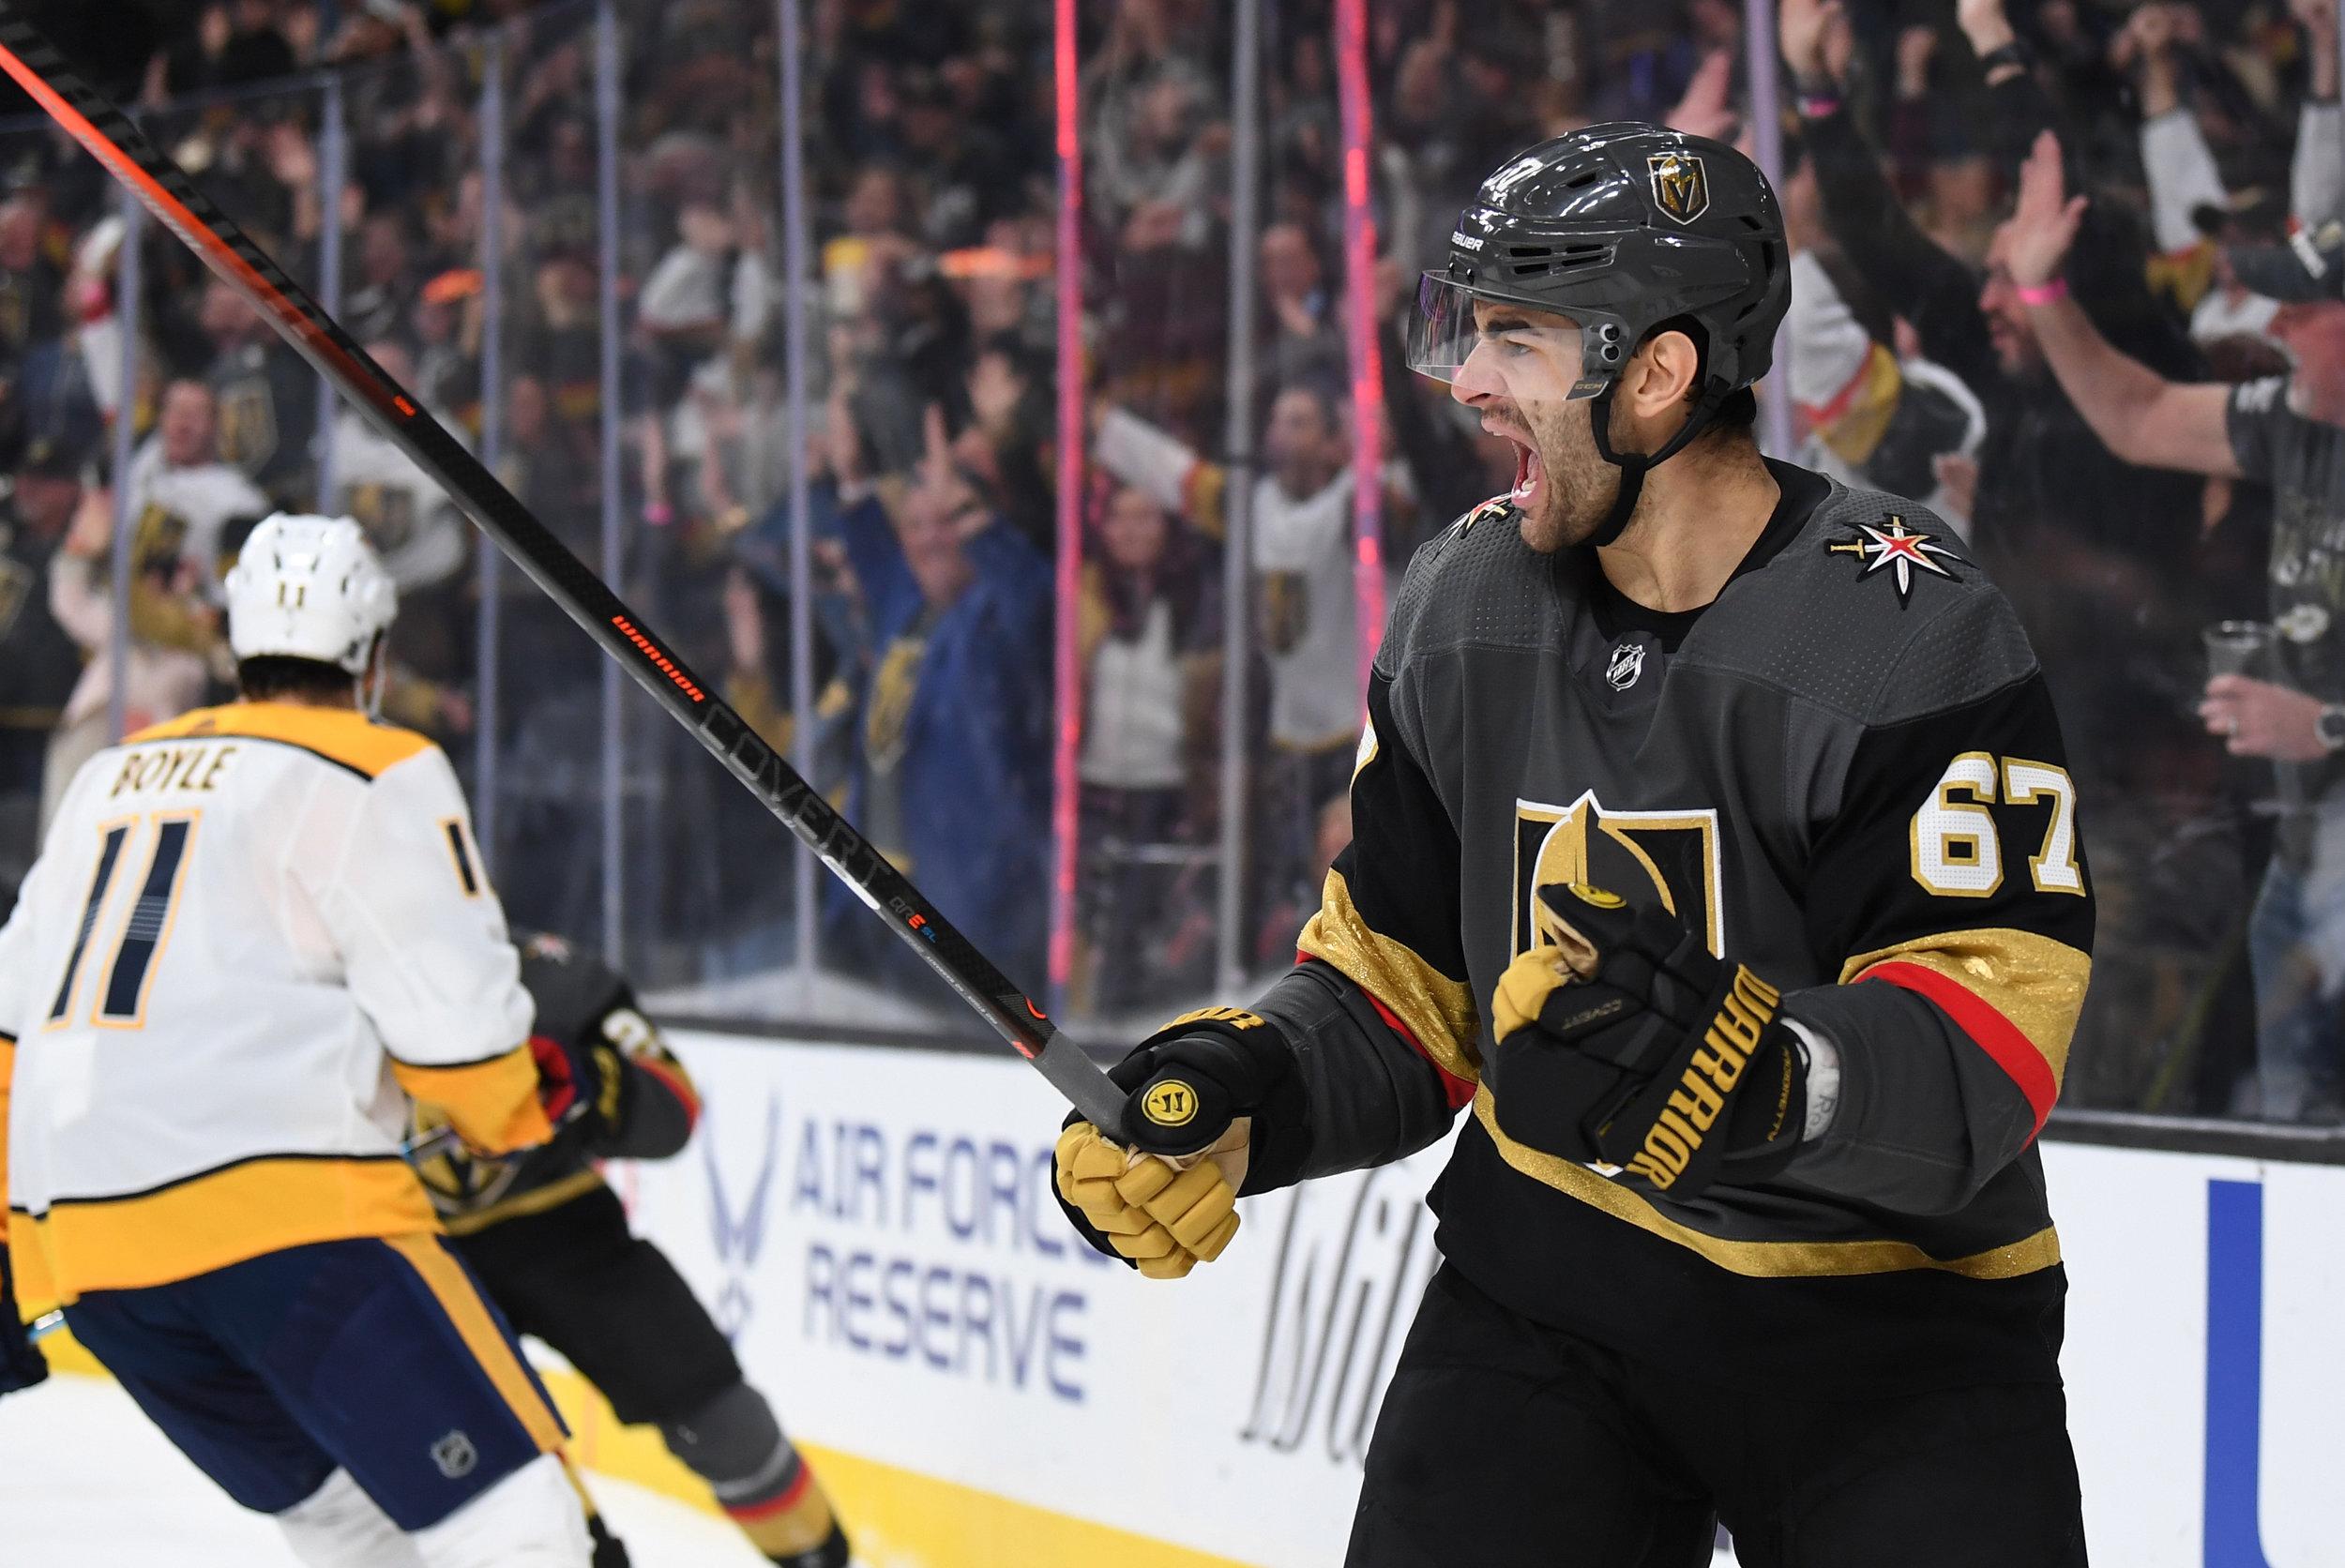 NHL_JB_2019-02-16_0065.jpg